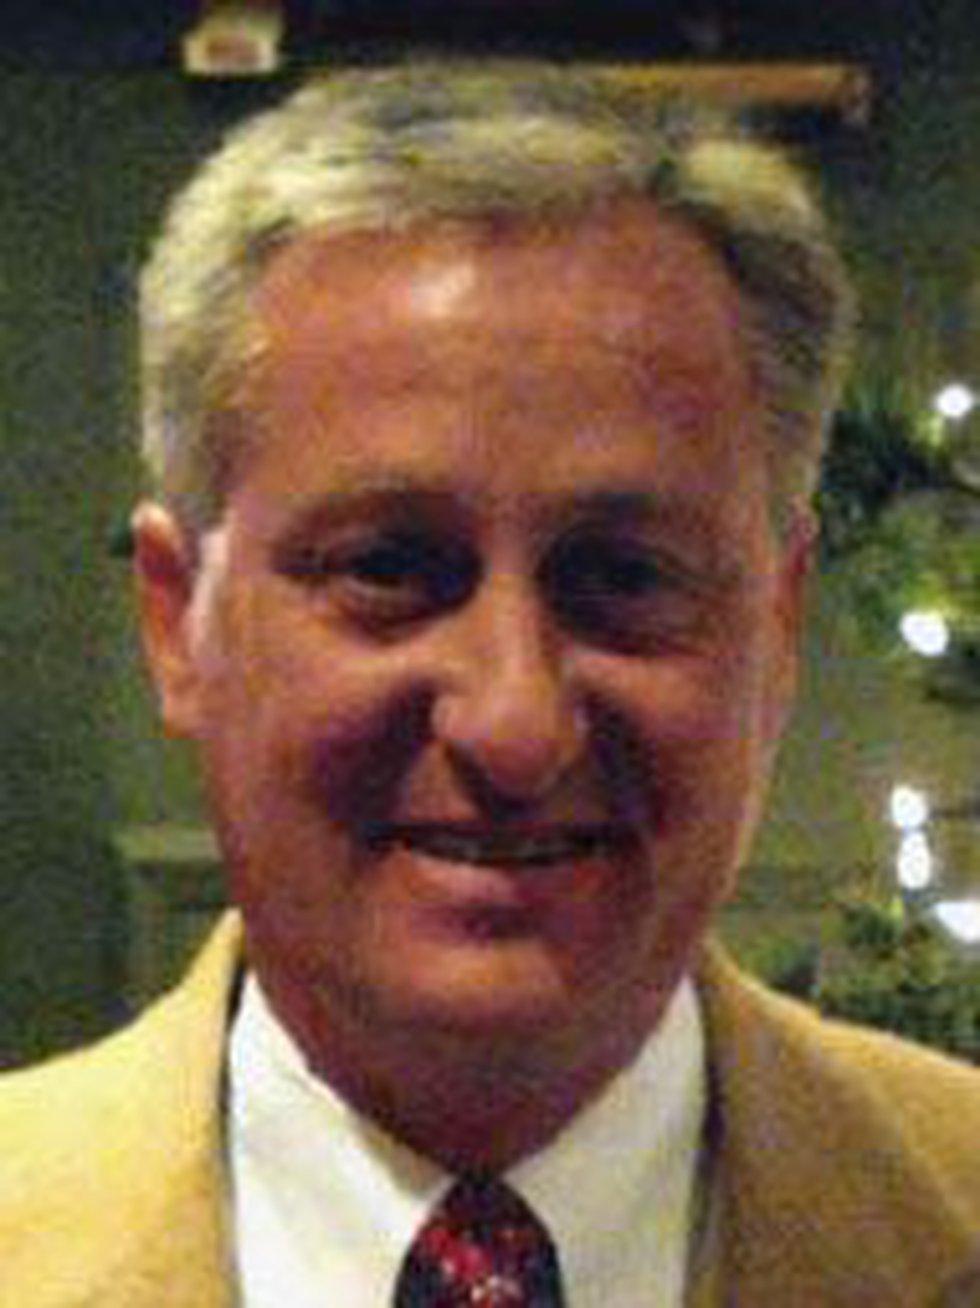 John Calvert (Photo courtesy Beaufort County Sheriff's Office)